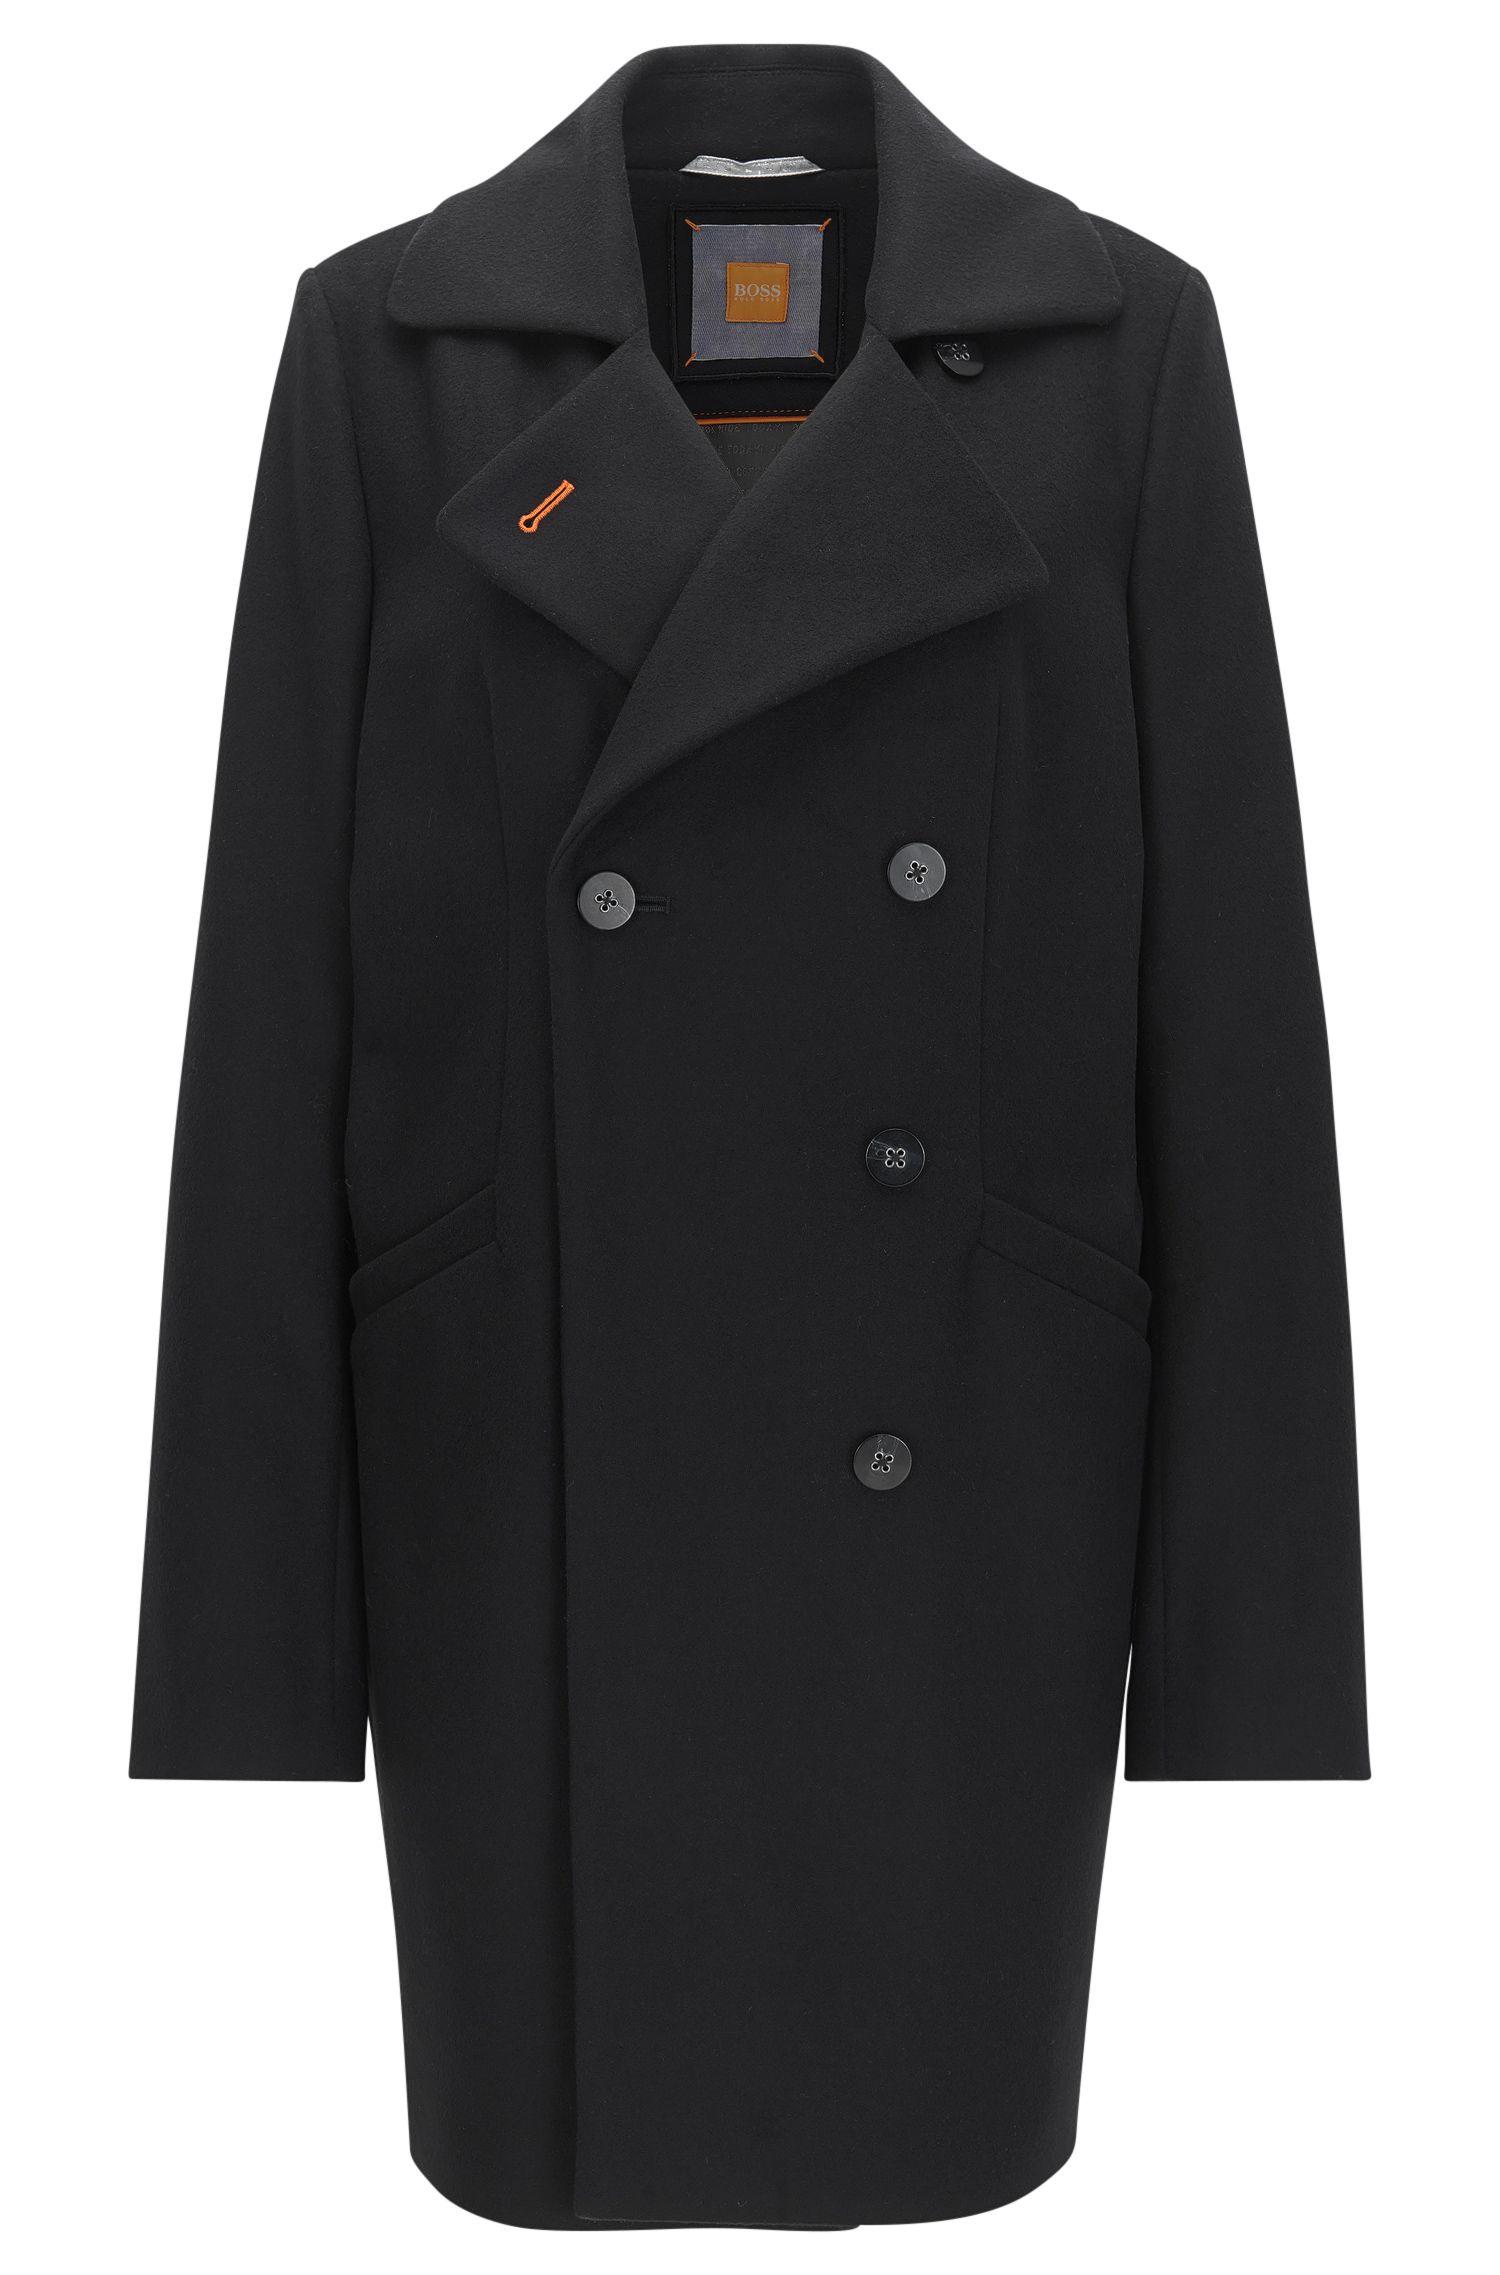 Zweireihiger Relaxed-Fit Mantel aus Schurwoll-Mix